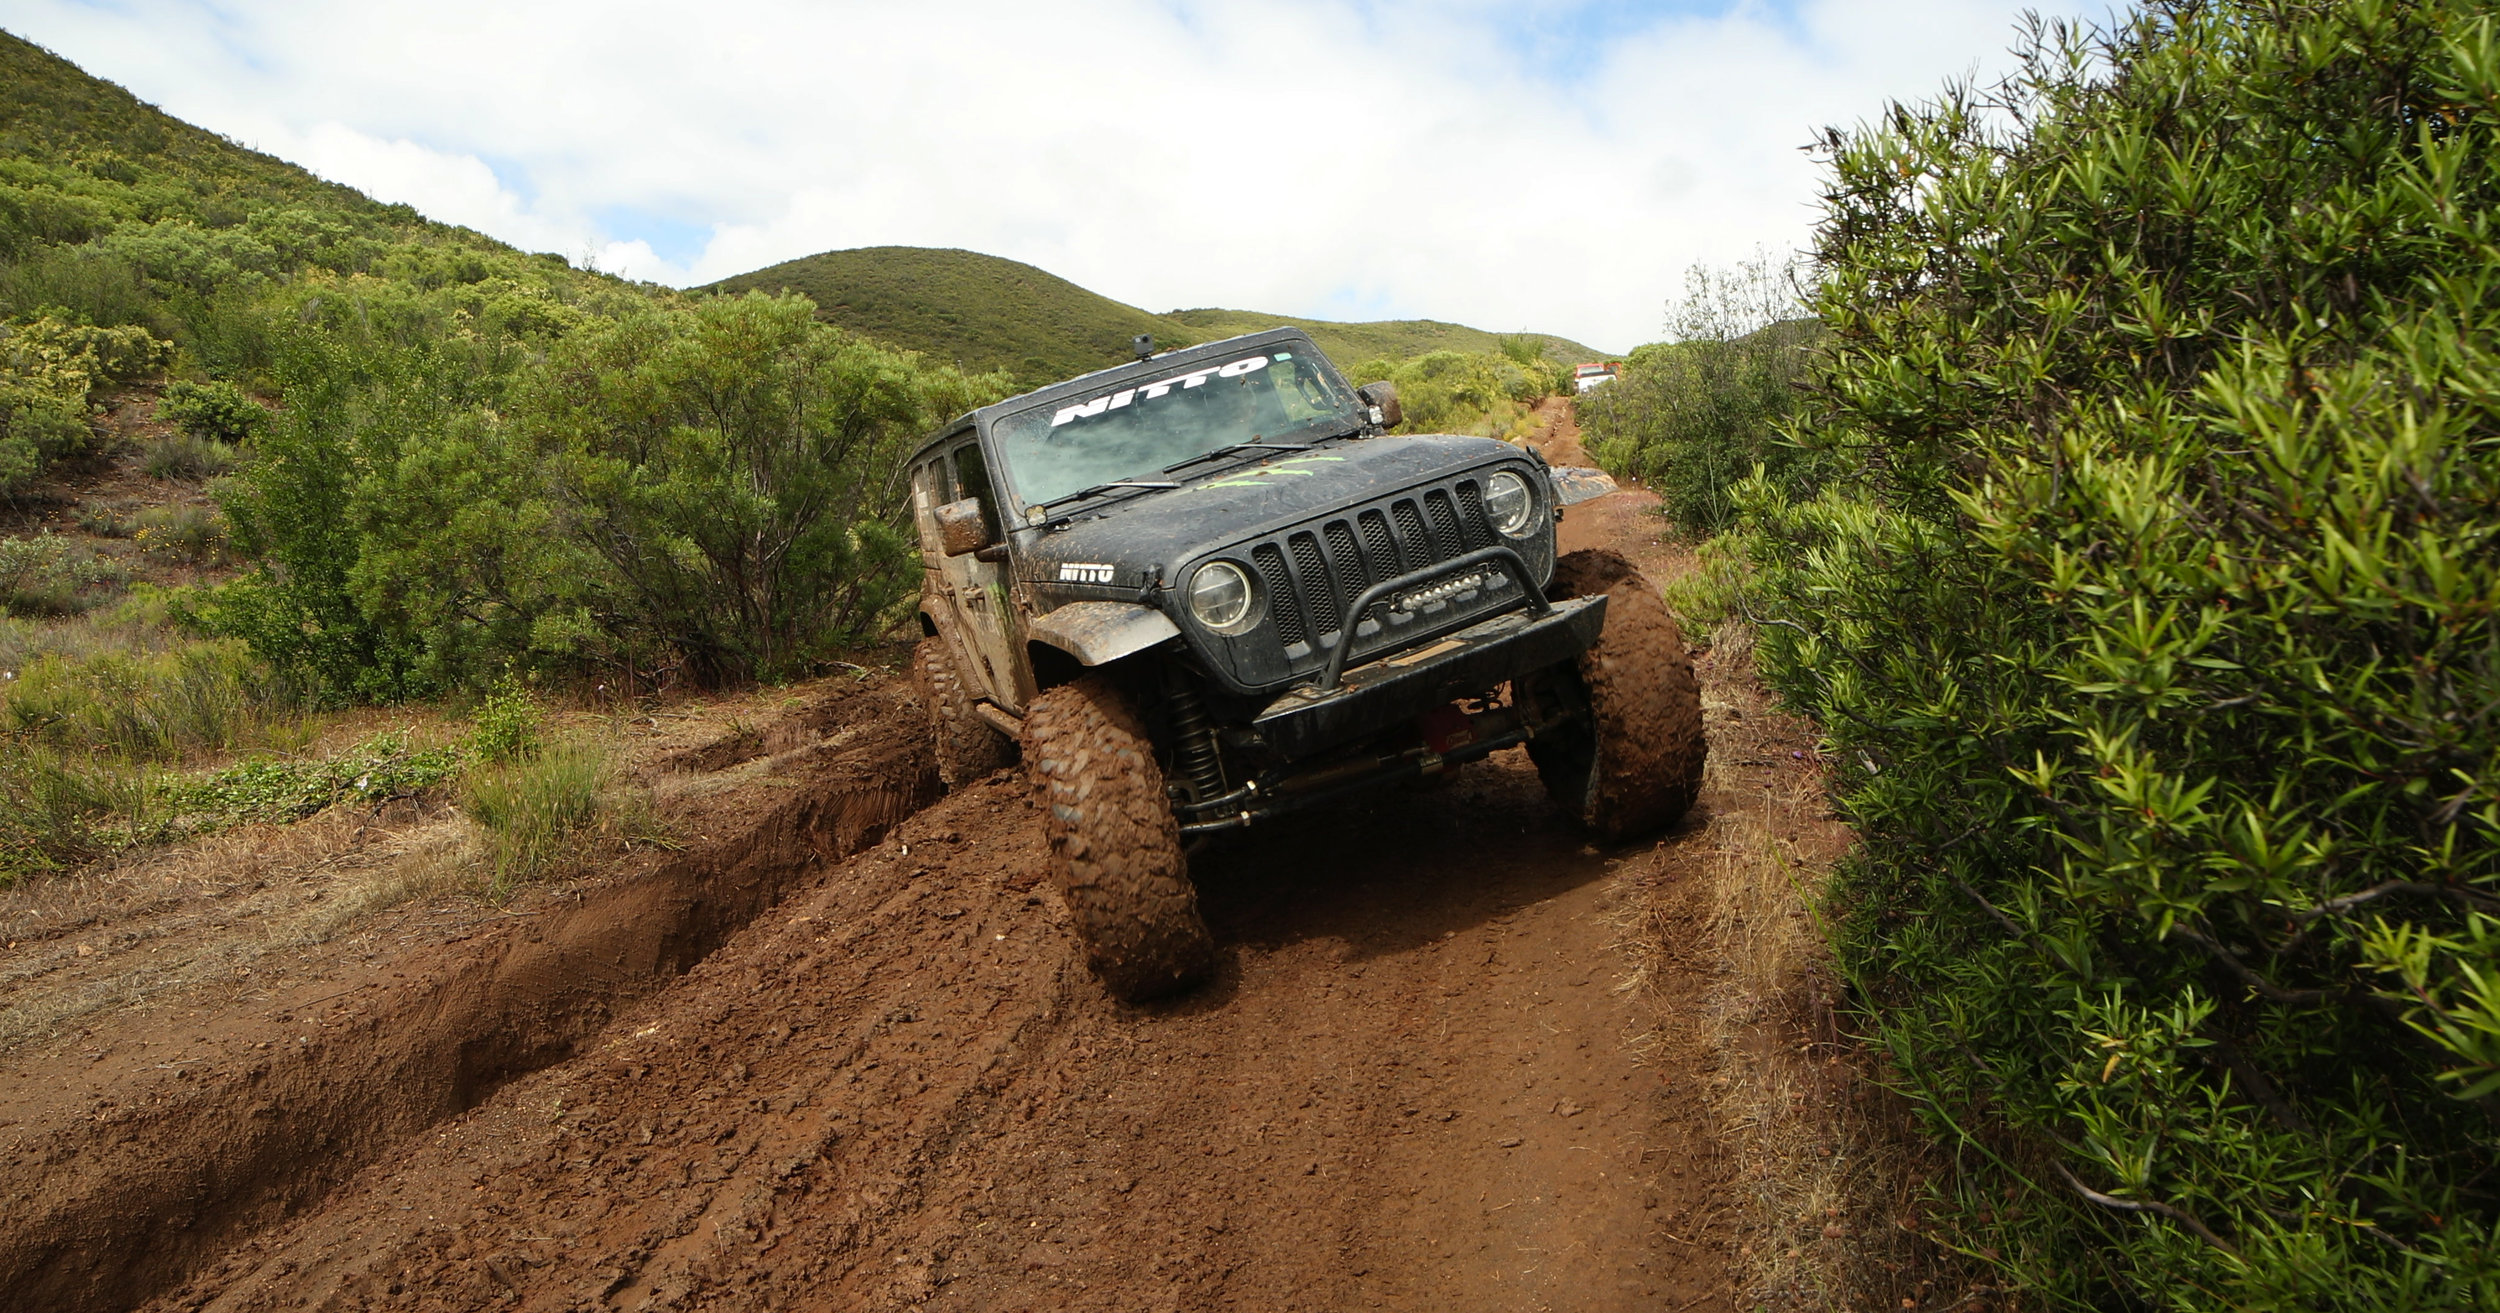 6_24_CaseyCurrie_Baja500PreRunning_BajaMexico_Jeep_025.jpg